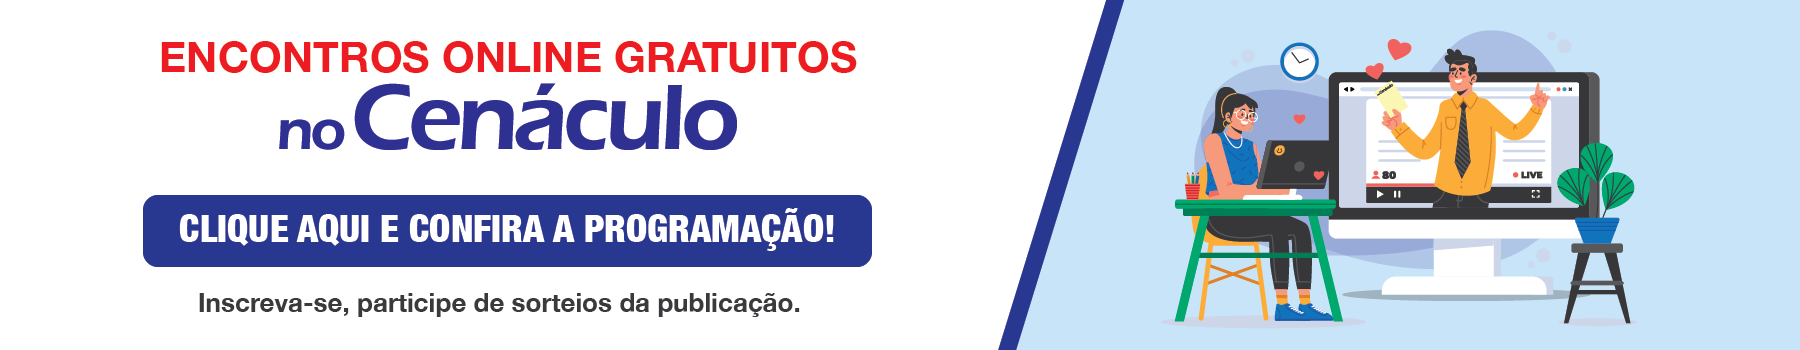 Encontros Online Gratuitos no Cenáculo